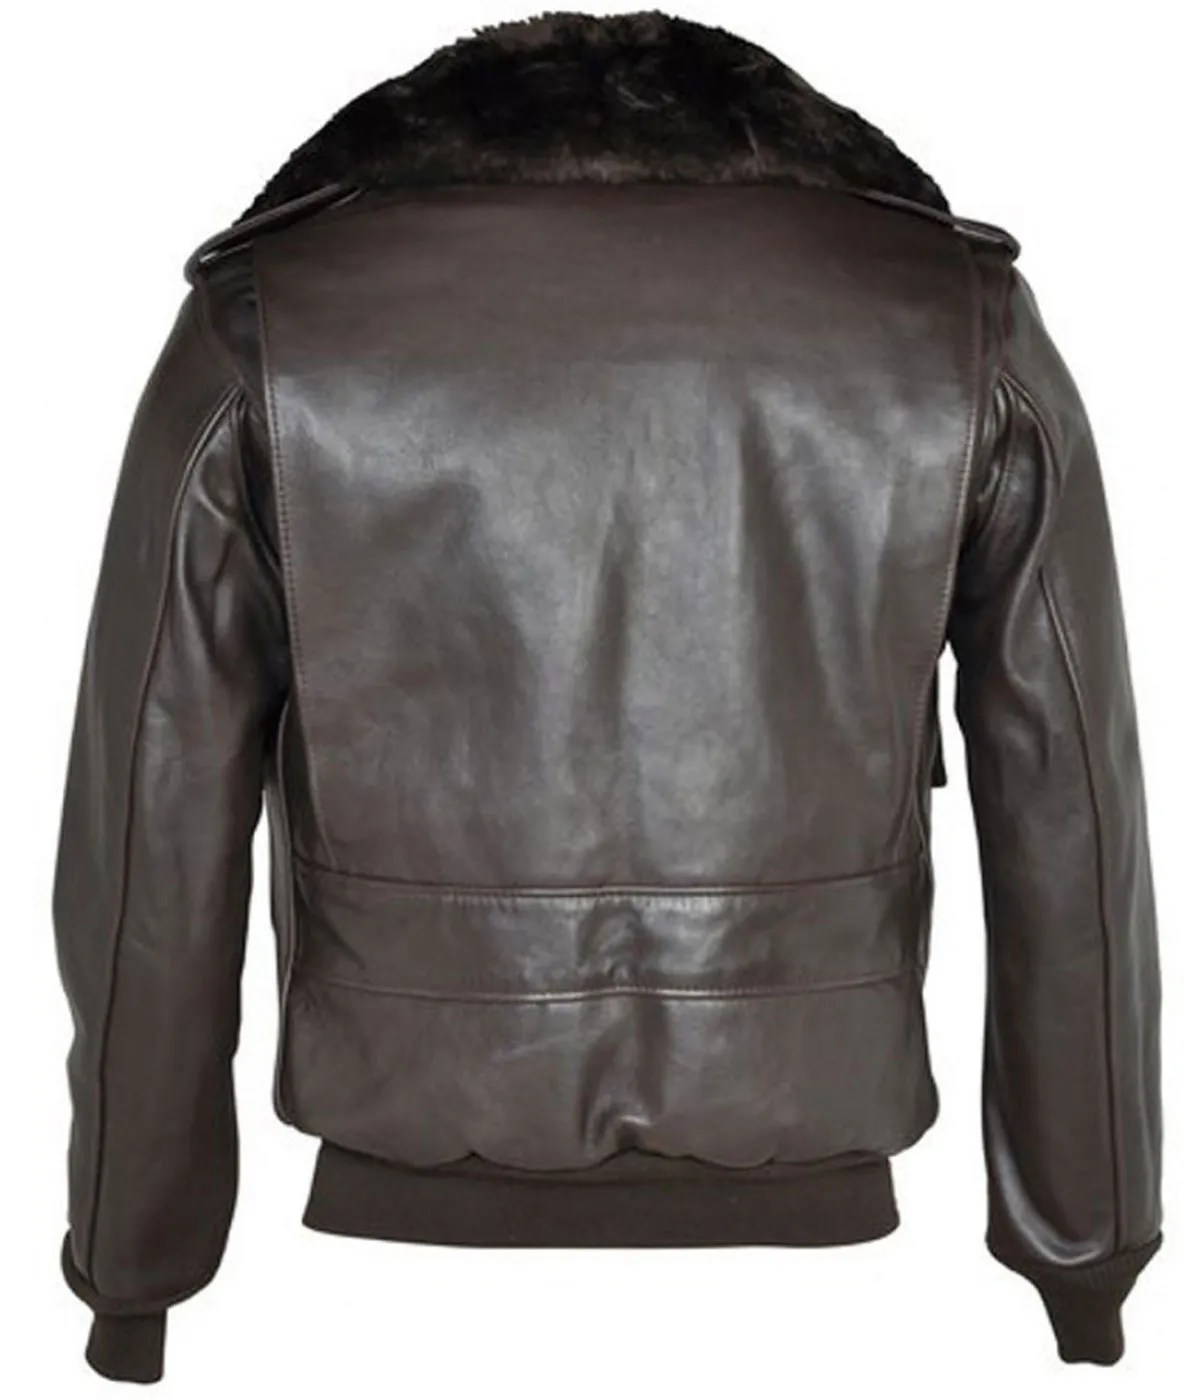 kurt-russellkurt-russell-the-thing-leather-jacket-the-thing-leather-jacket